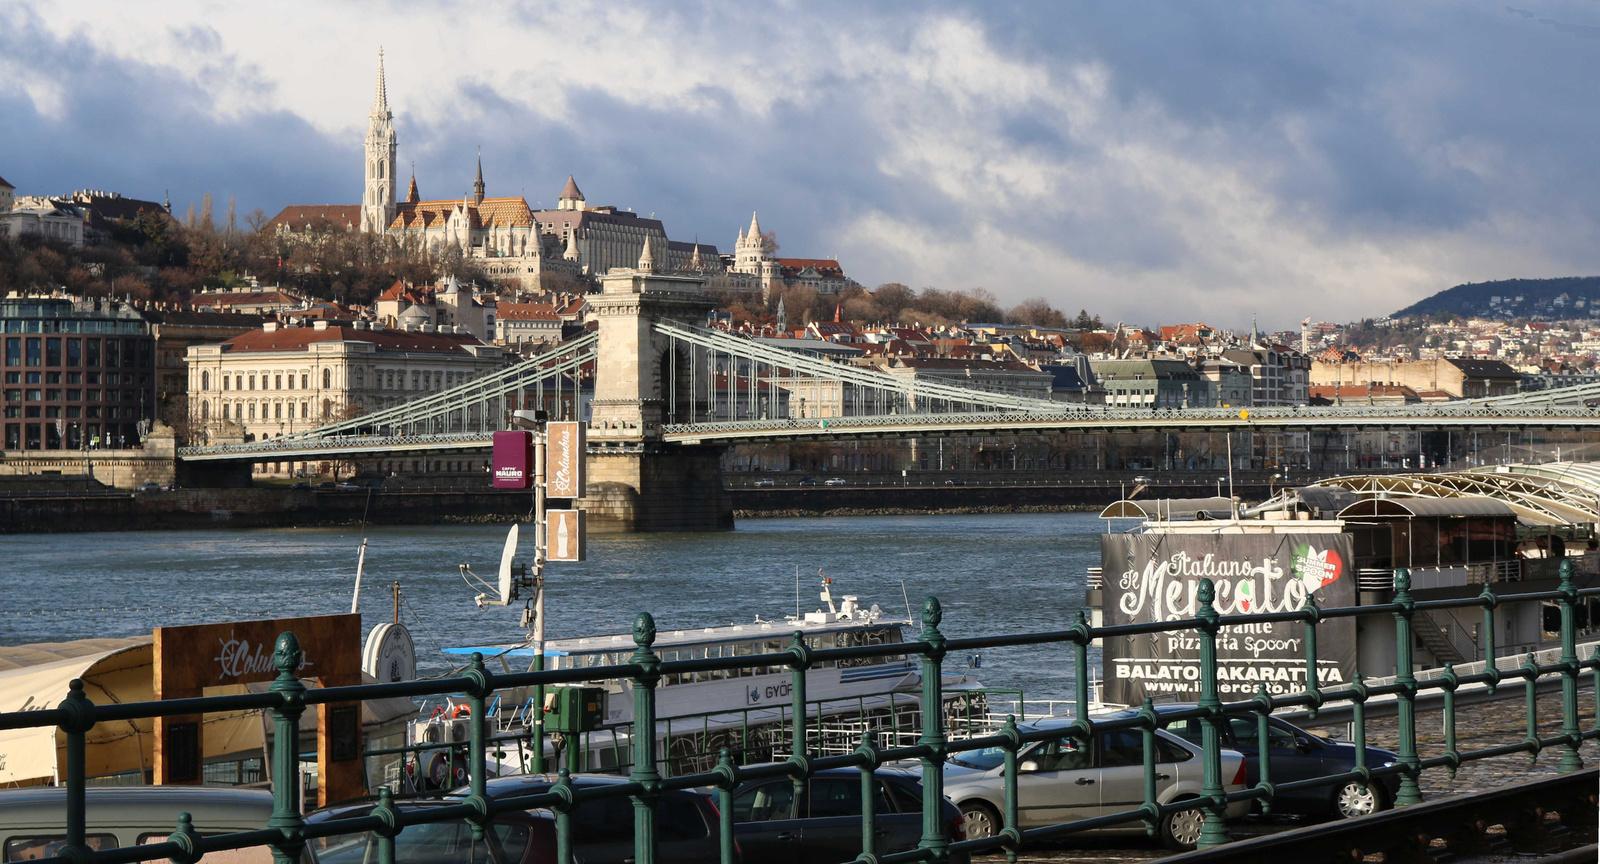 BudapBudapest eső után 010